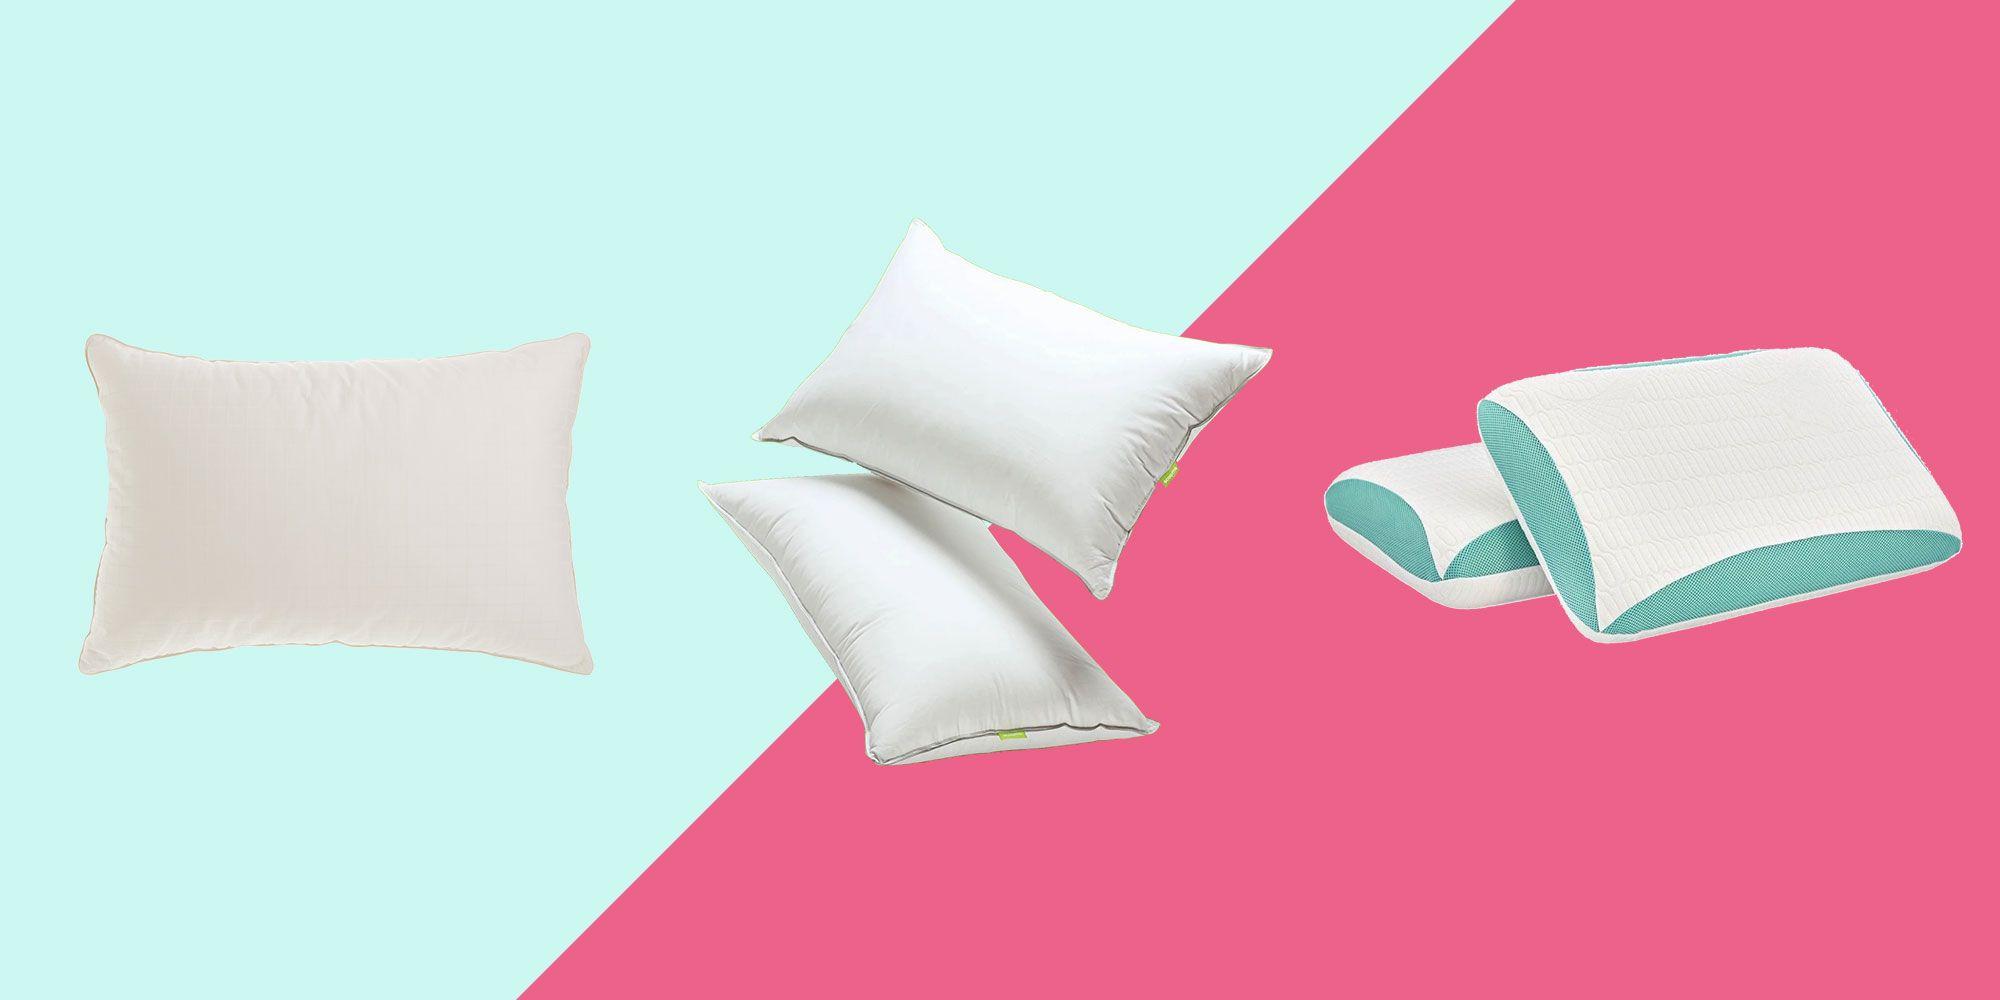 best pillows uk 2021 13 top picks for